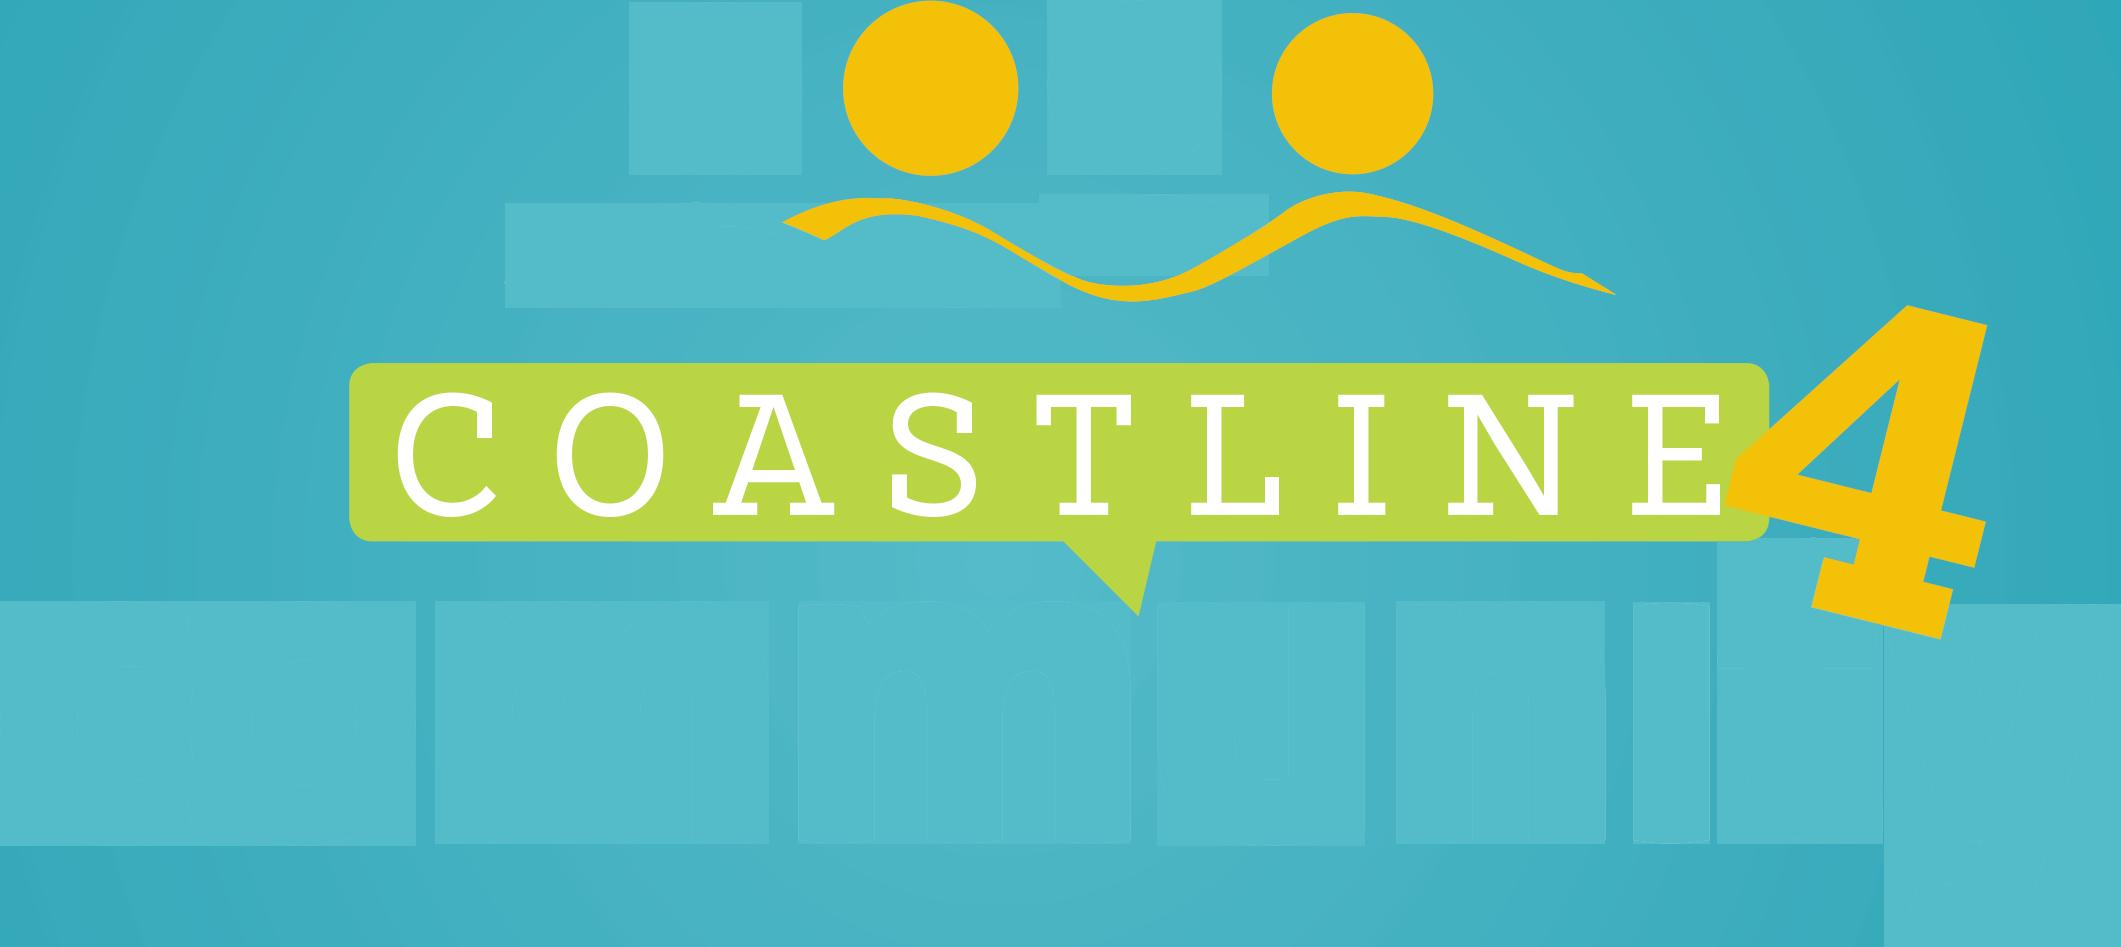 Coastline4community logo png_BLUE